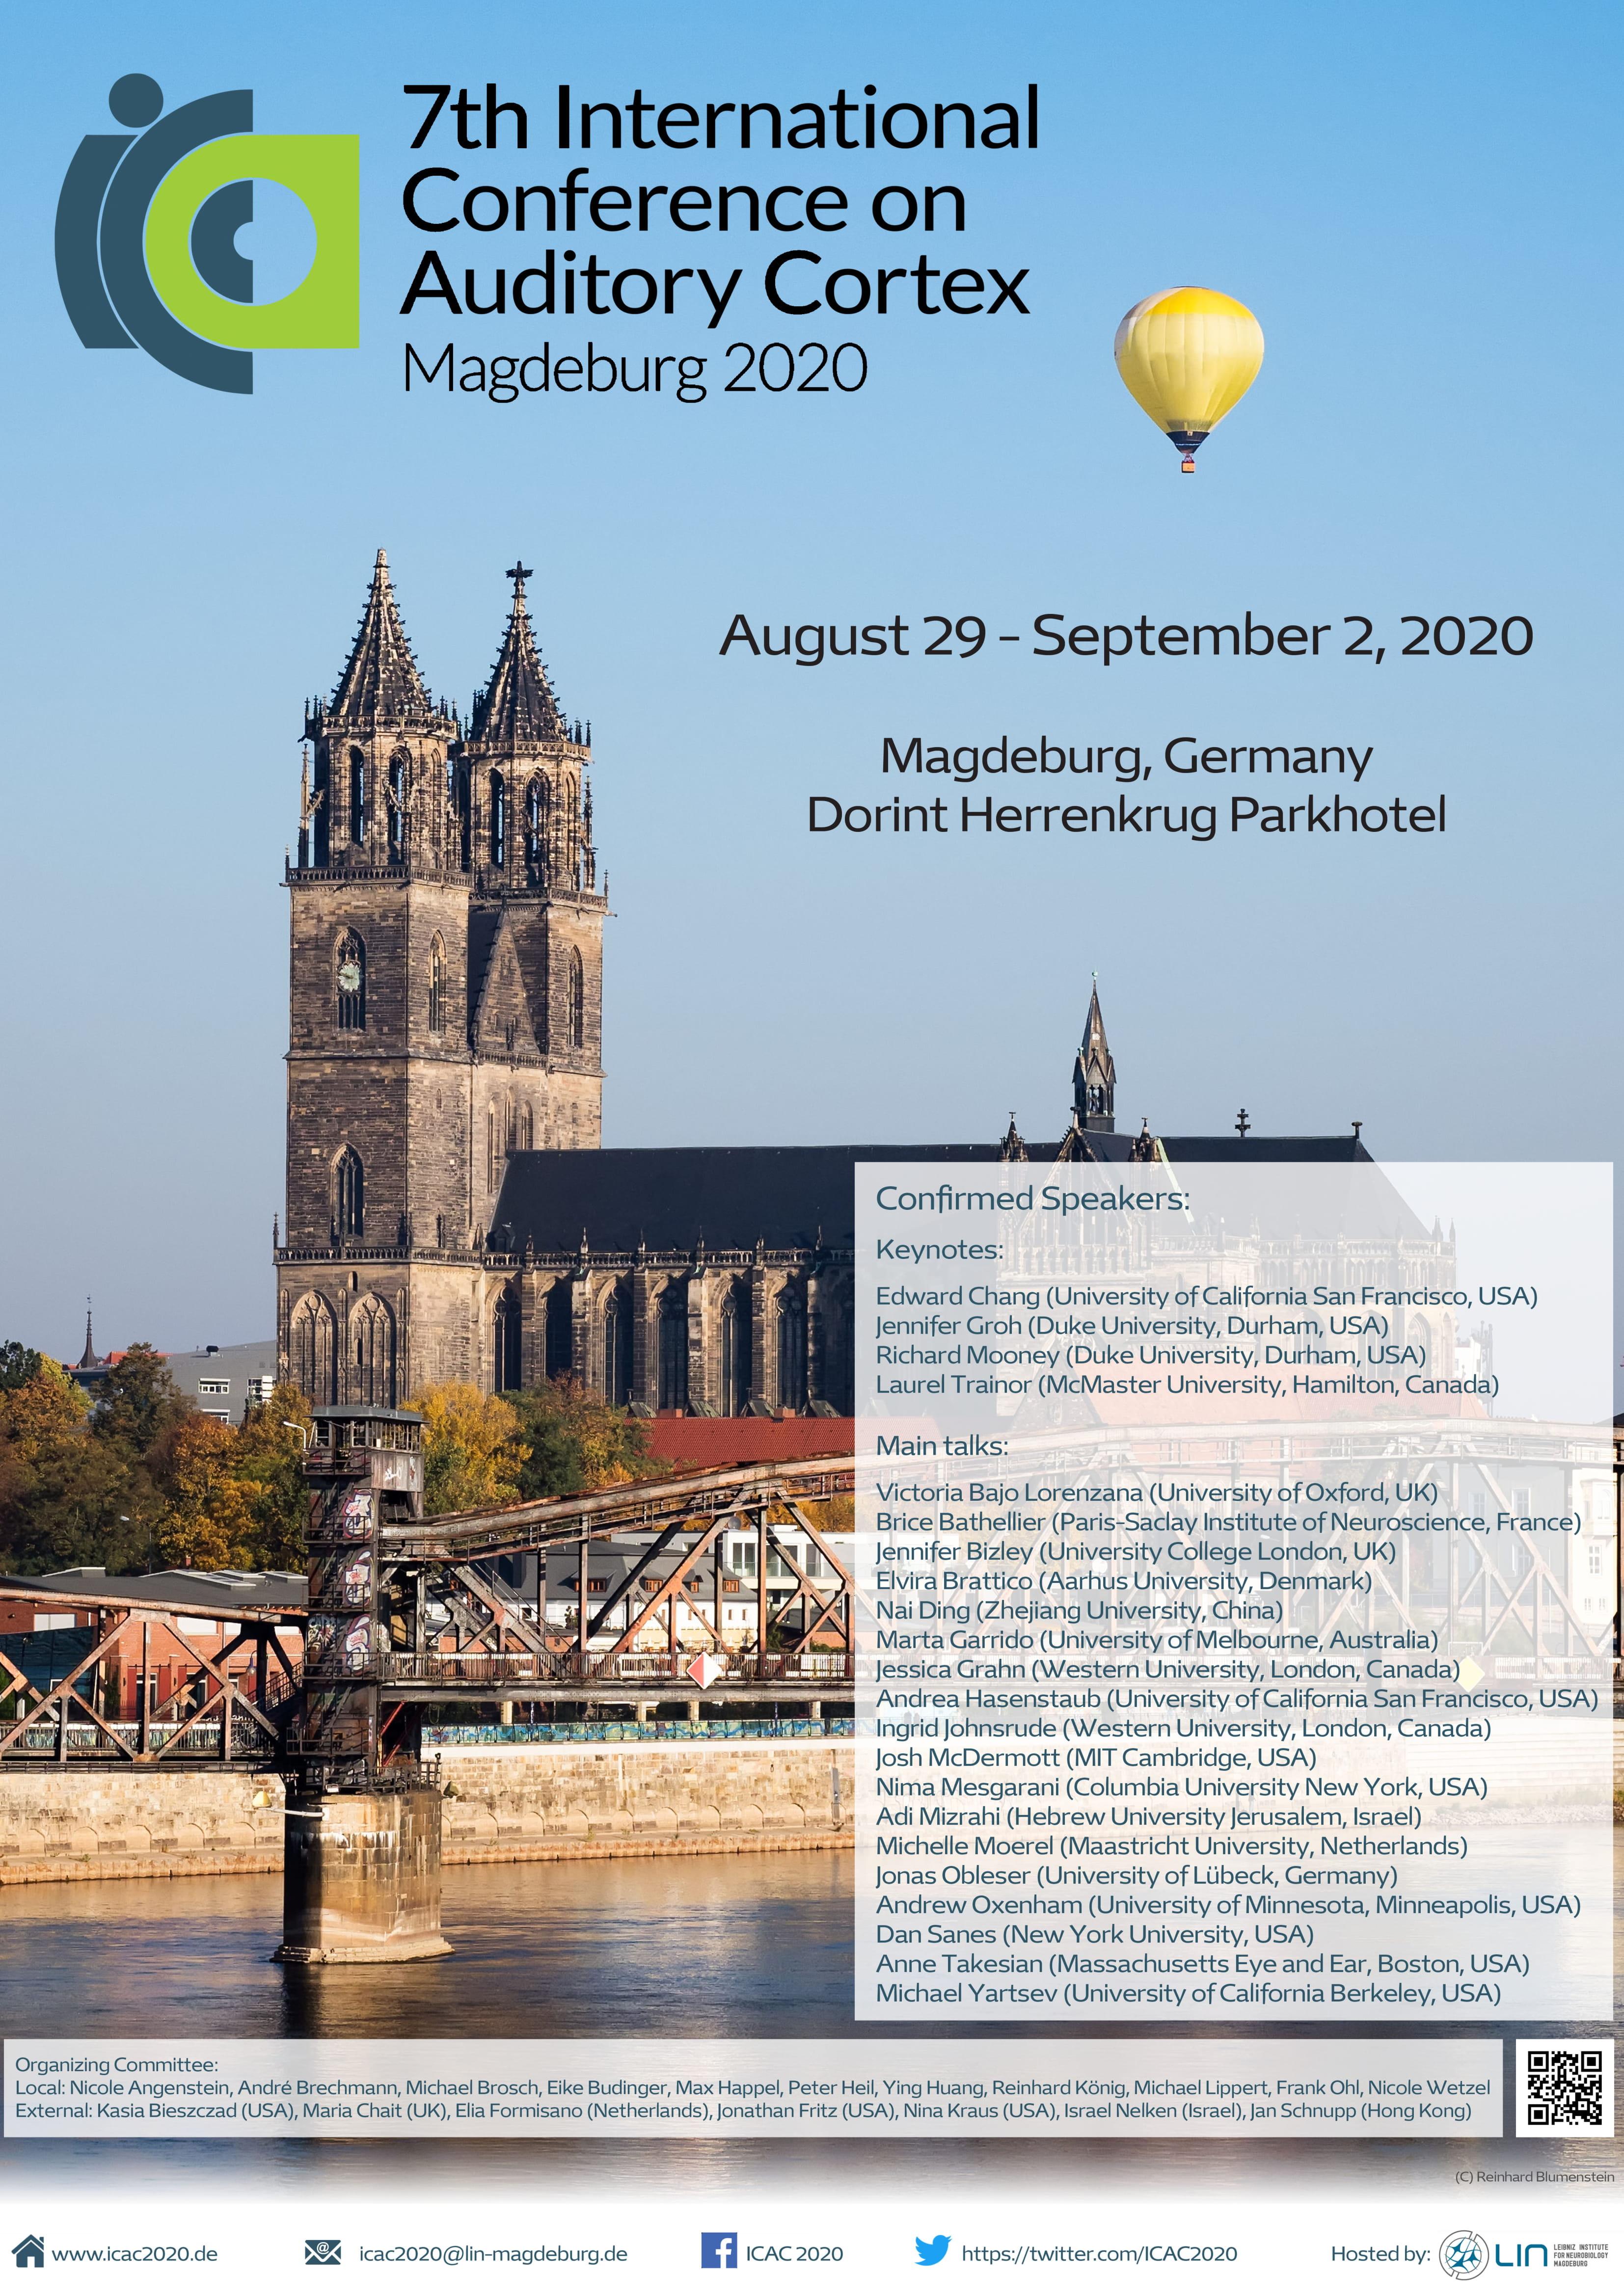 Postponed to August 2021: 7th International Conference on Auditory Cortex @ Herrenkrug Parkhotel